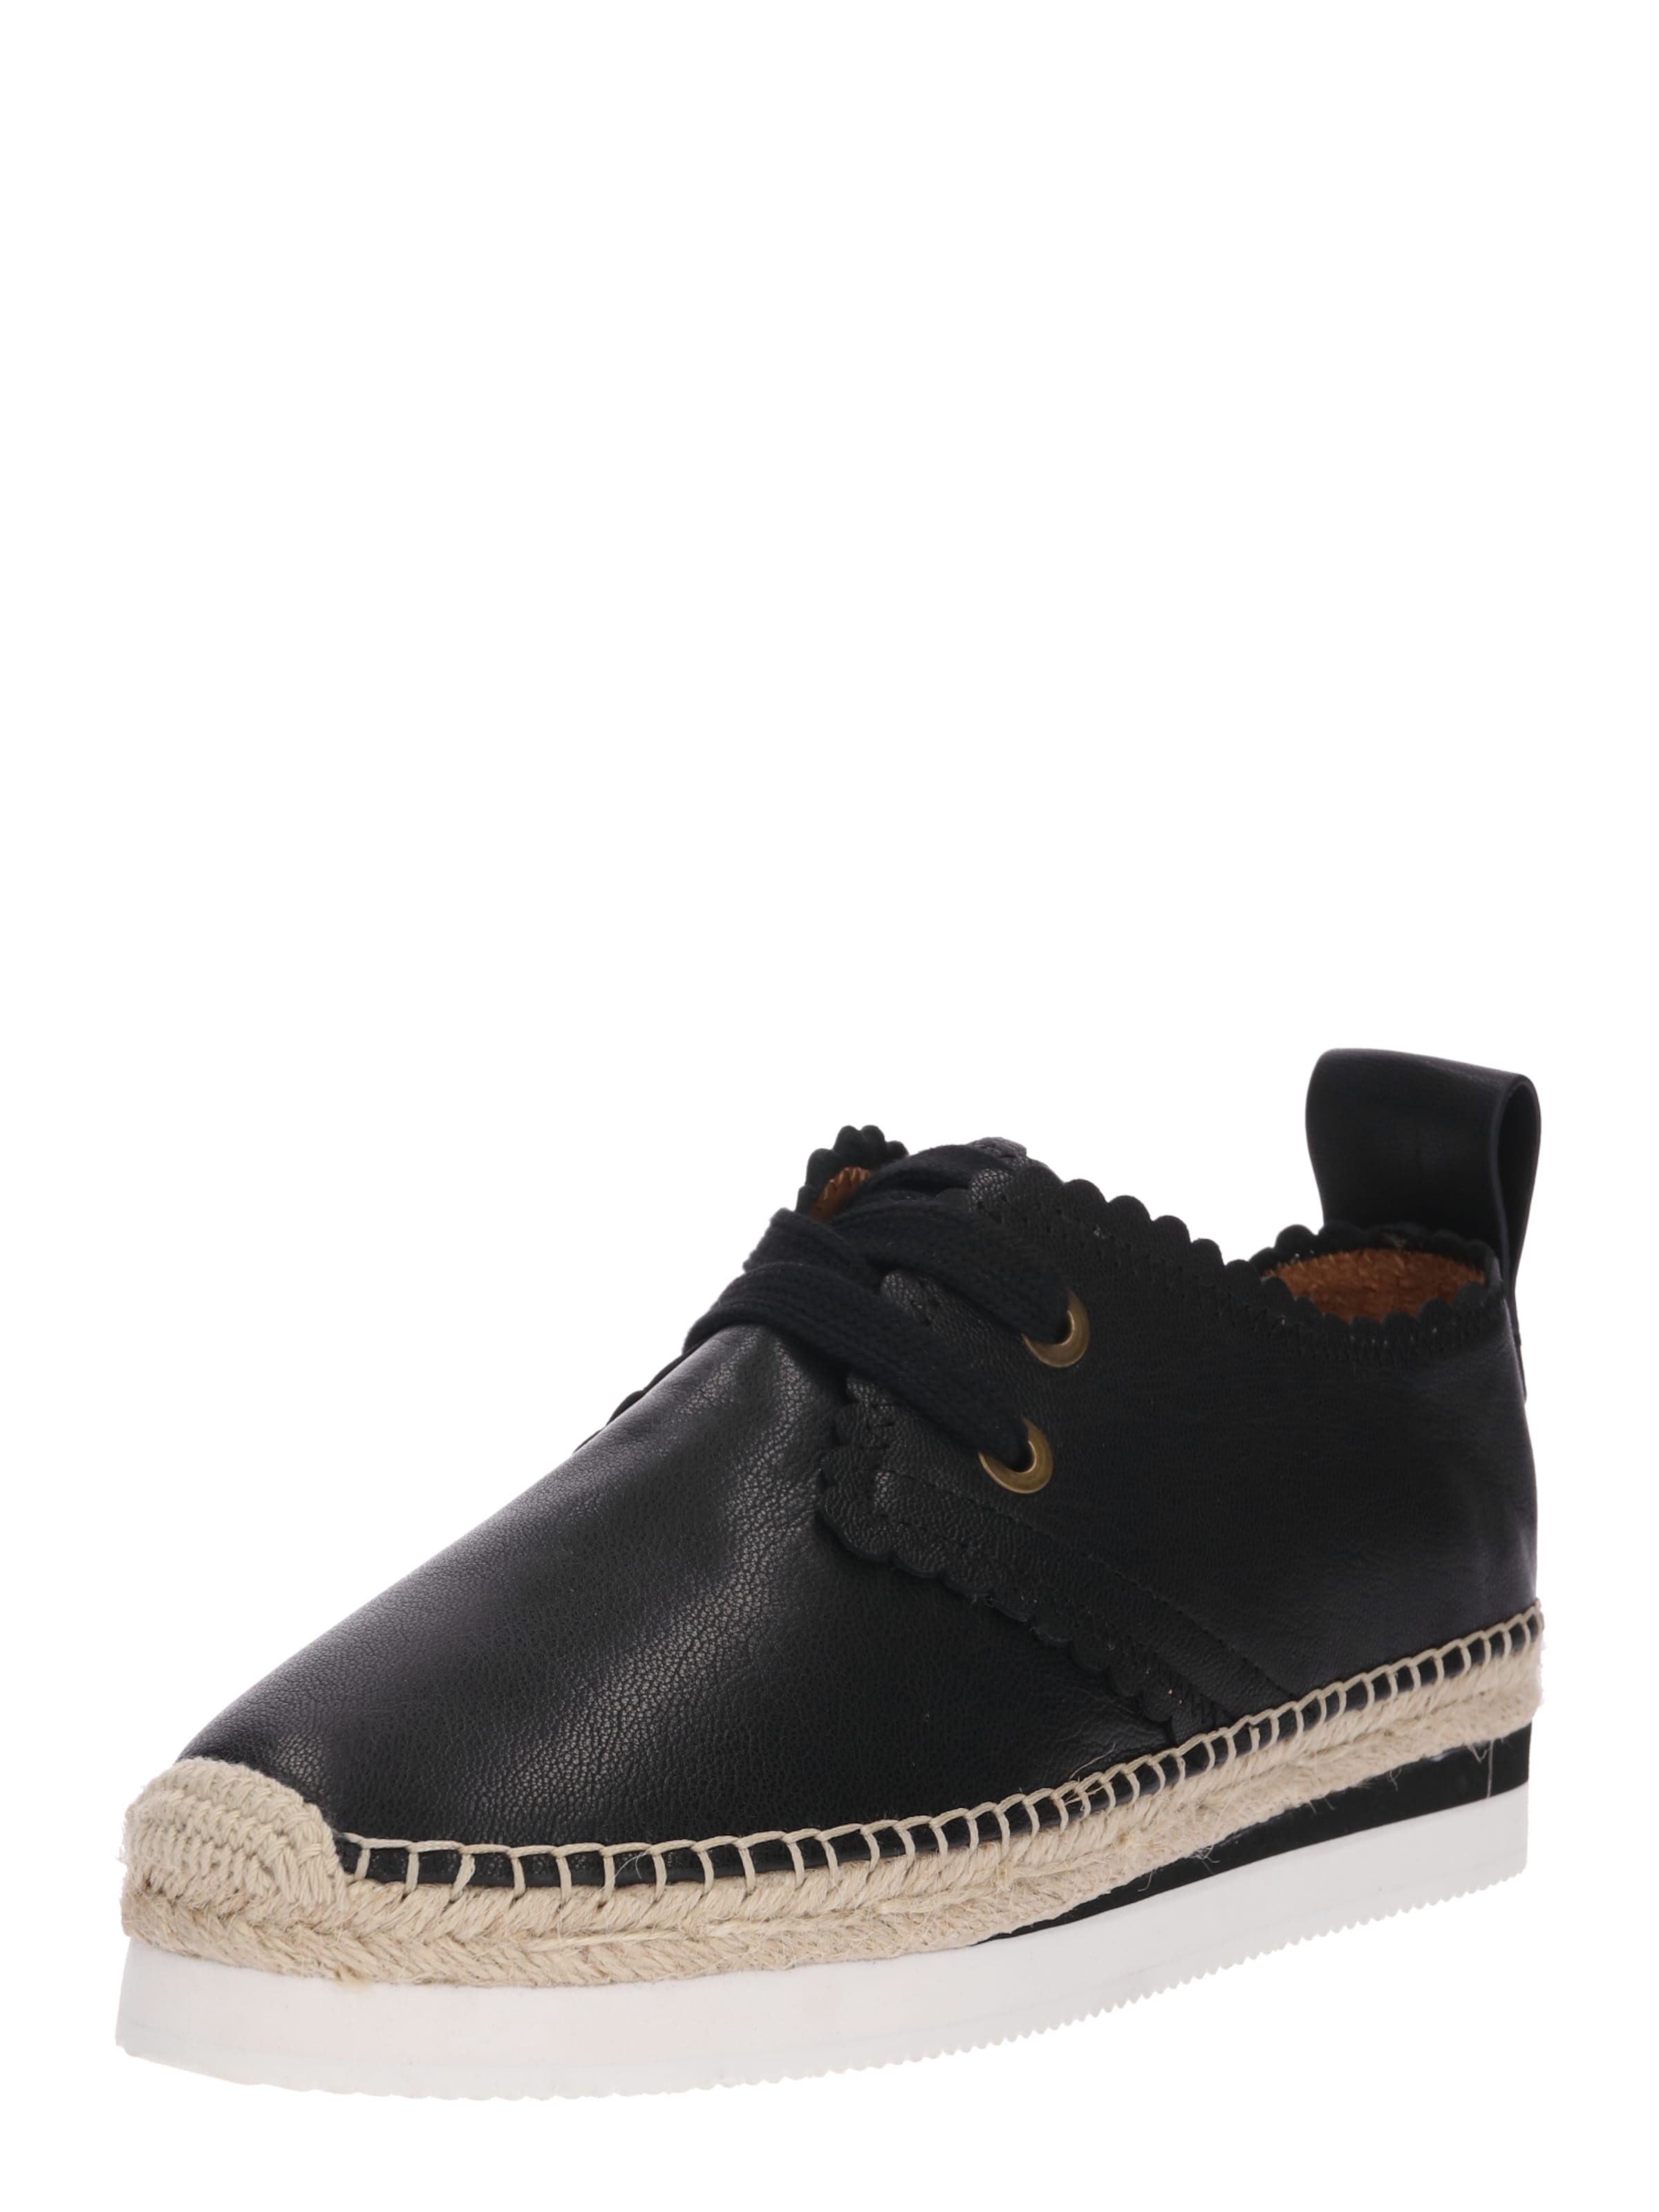 SEE BY CHLOE Sneaker Verschleißfeste billige Schuhe